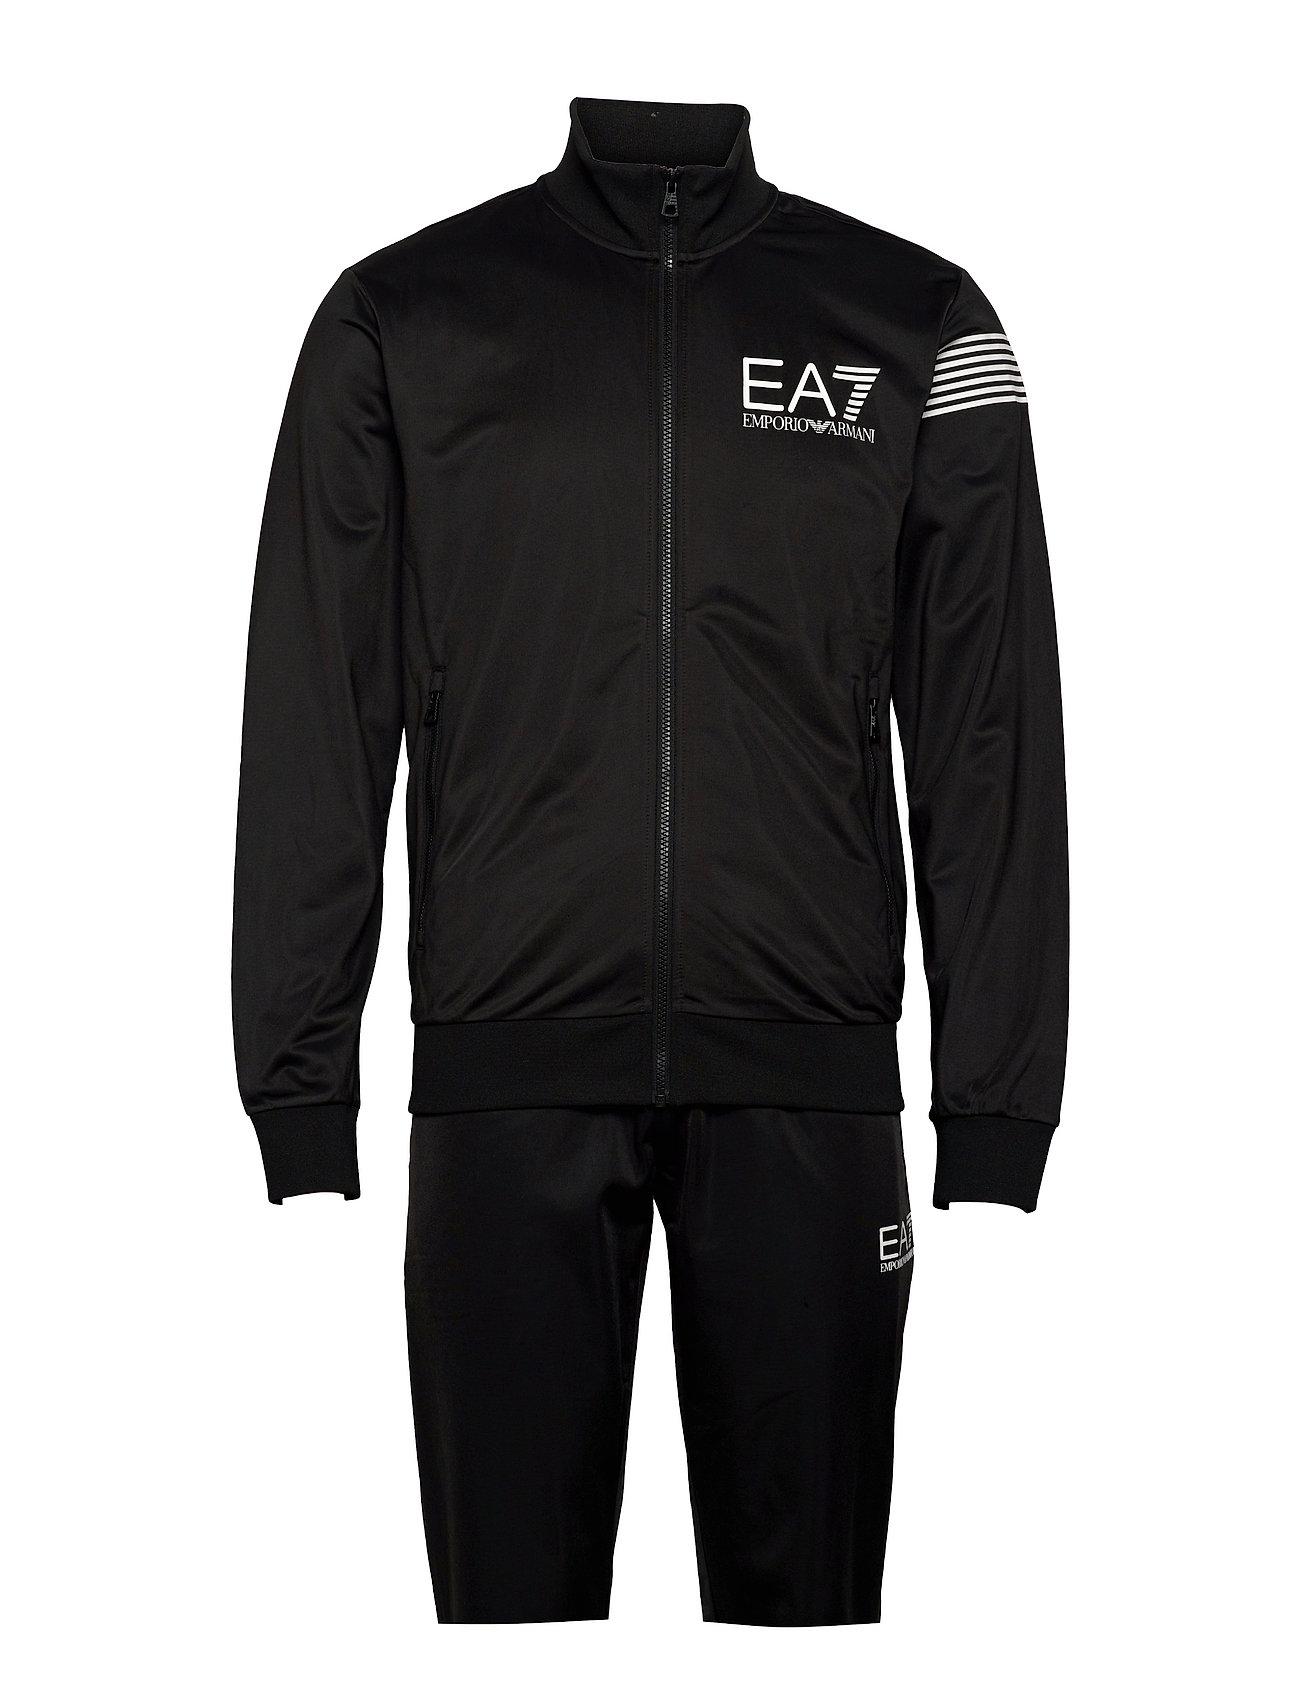 Tracksuit Sweatshirts & Hoodies Tracksuits - SETS Sort EA7